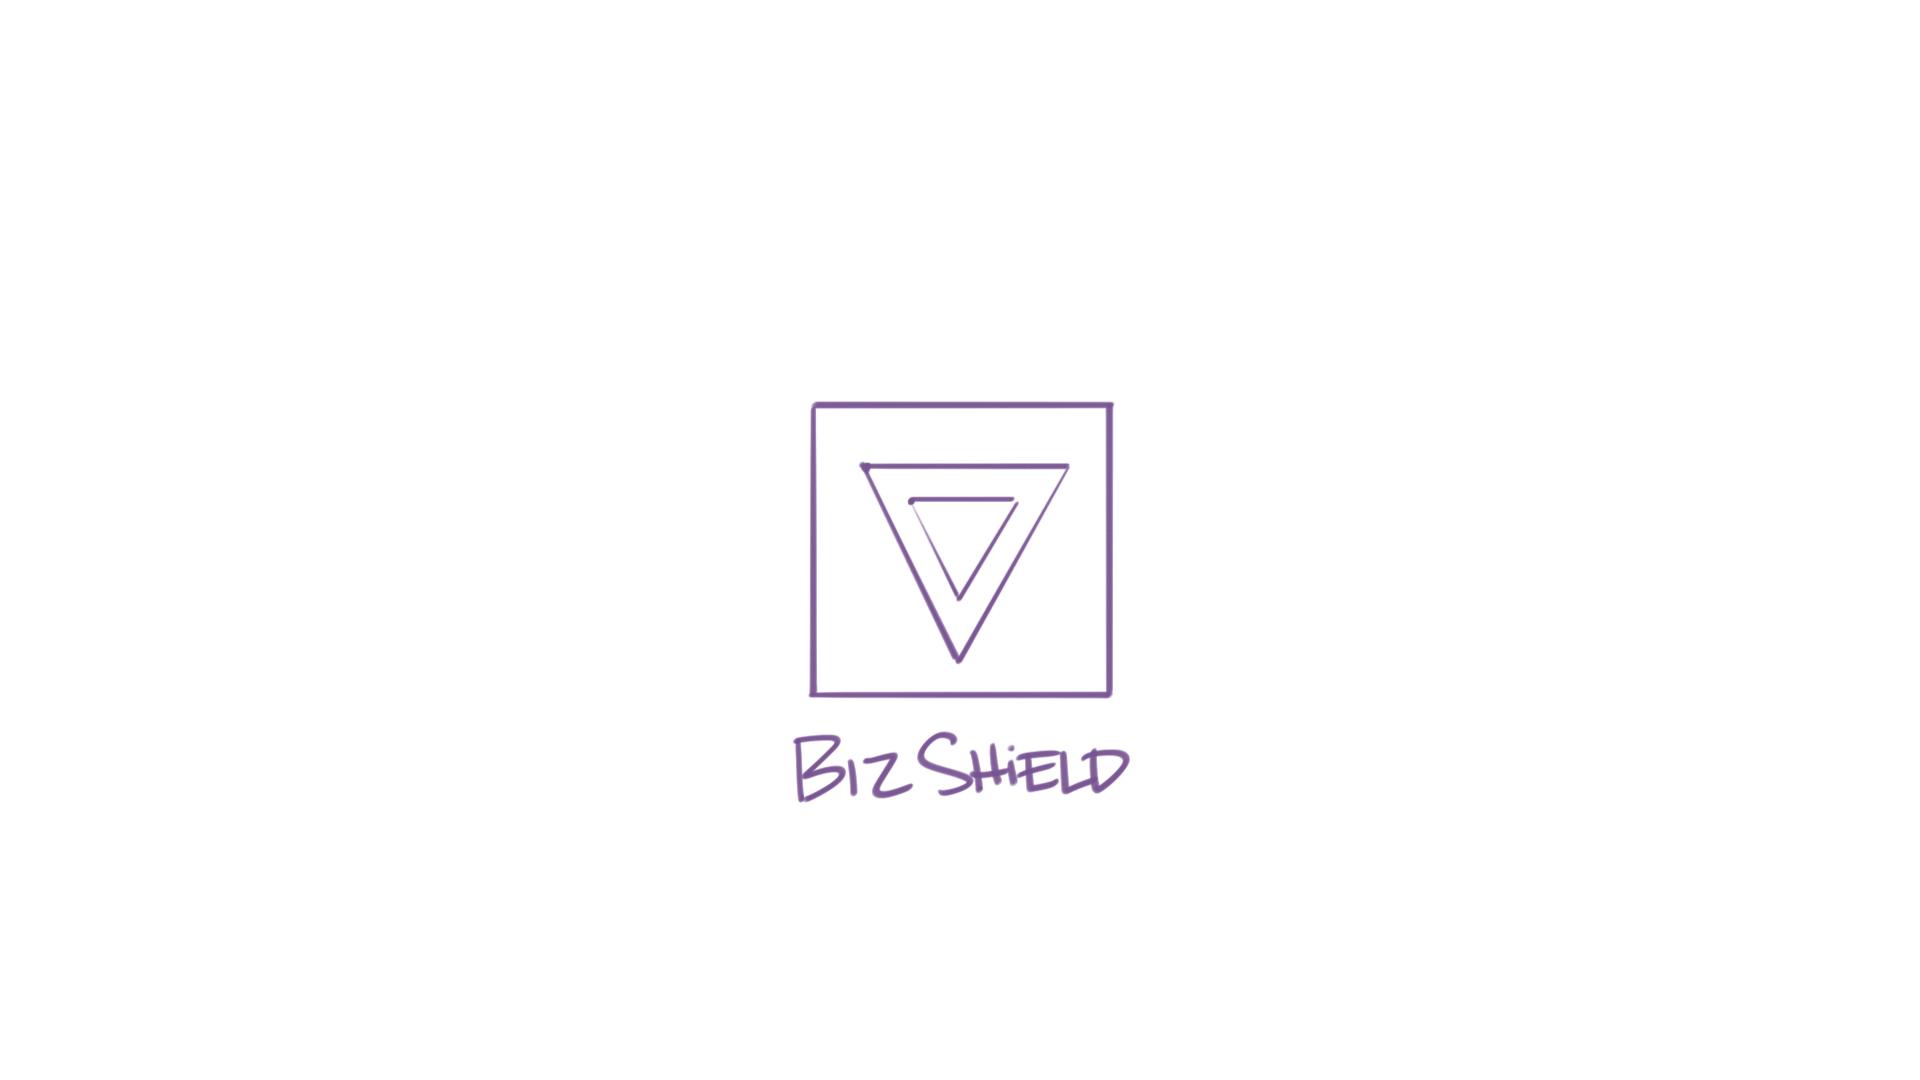 BizShield_TM_v3_0038_39.jpg